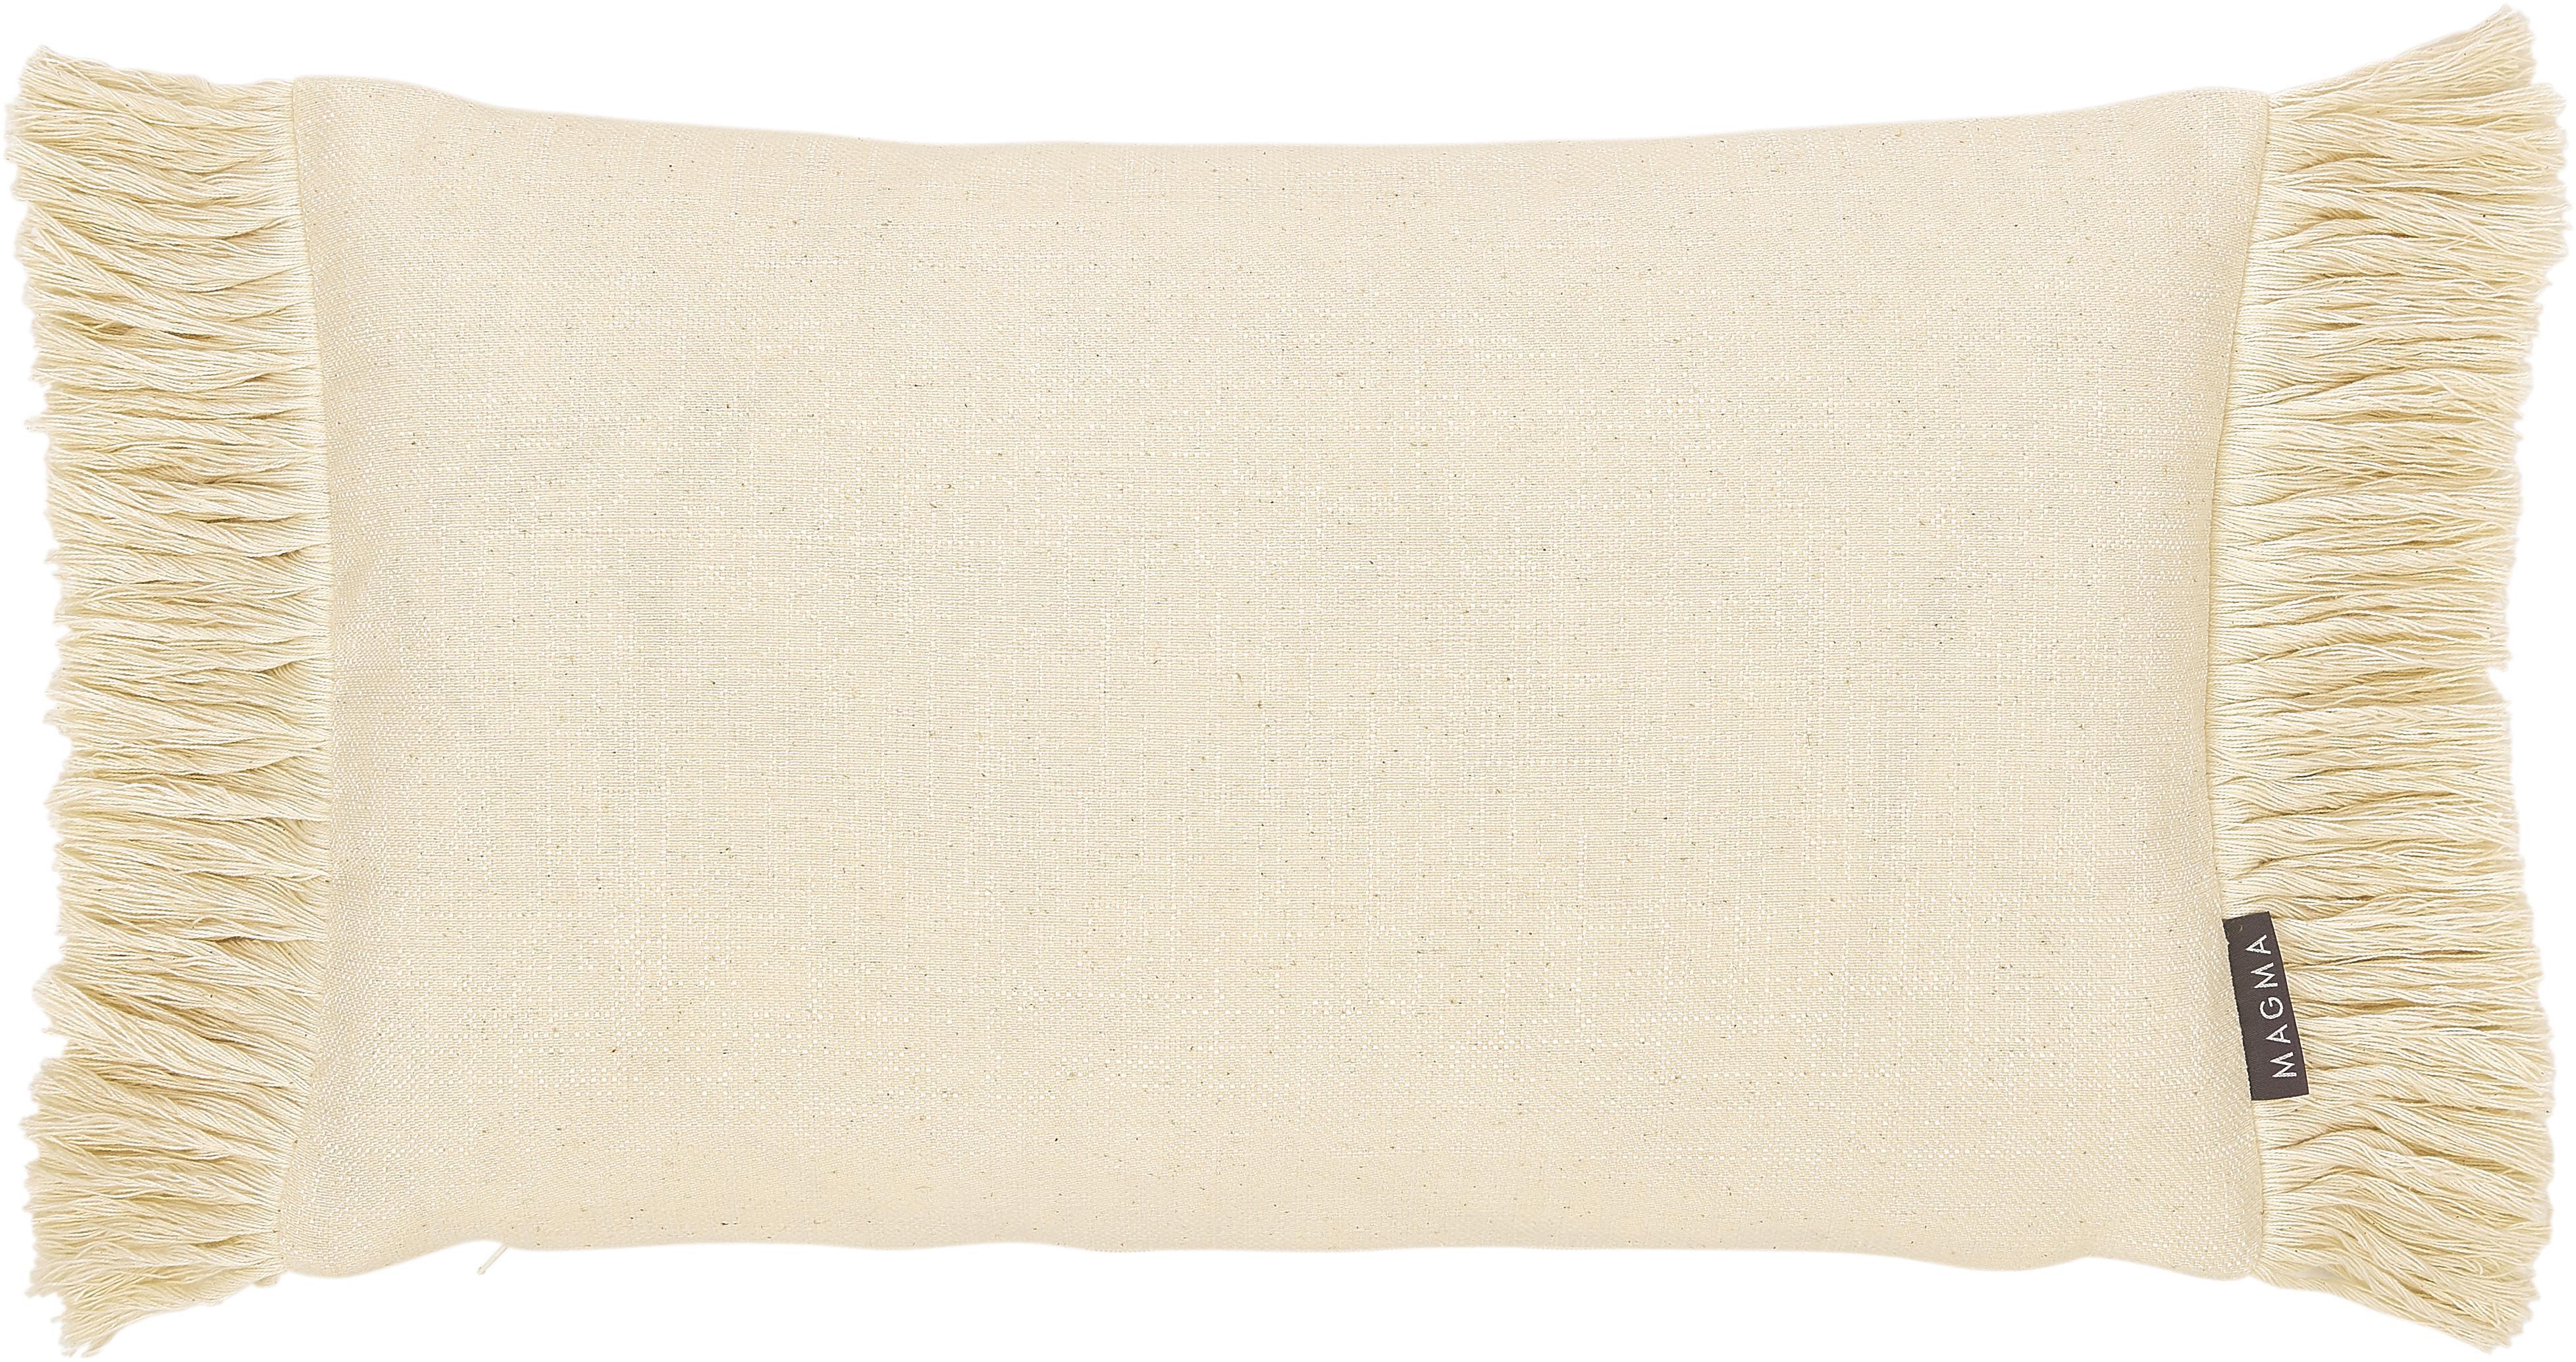 Kissenhülle Tine mit Fransen, Webart: Jacquard, Beige, 30 x 50 cm